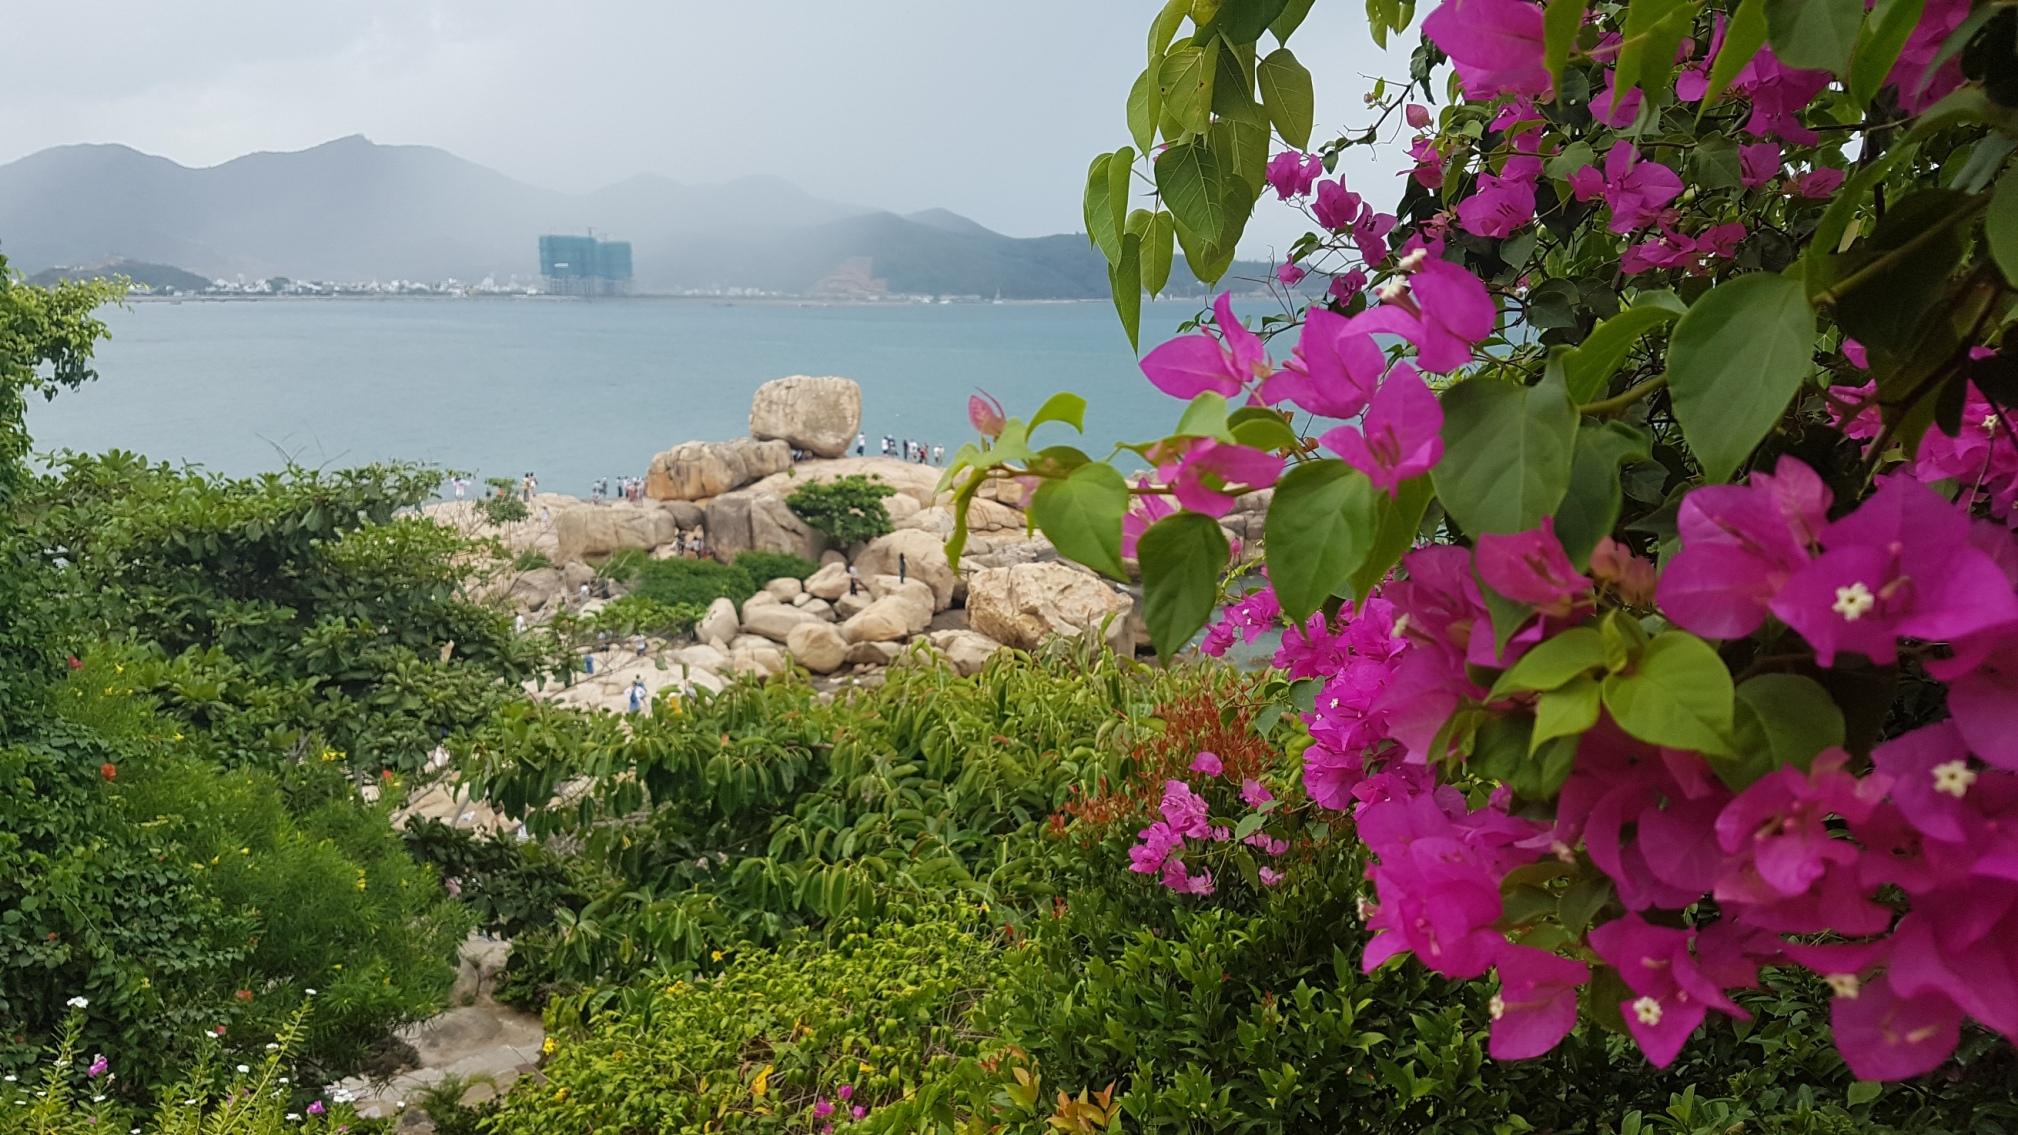 Фото острова с цветущими орхидеями в Нячанге